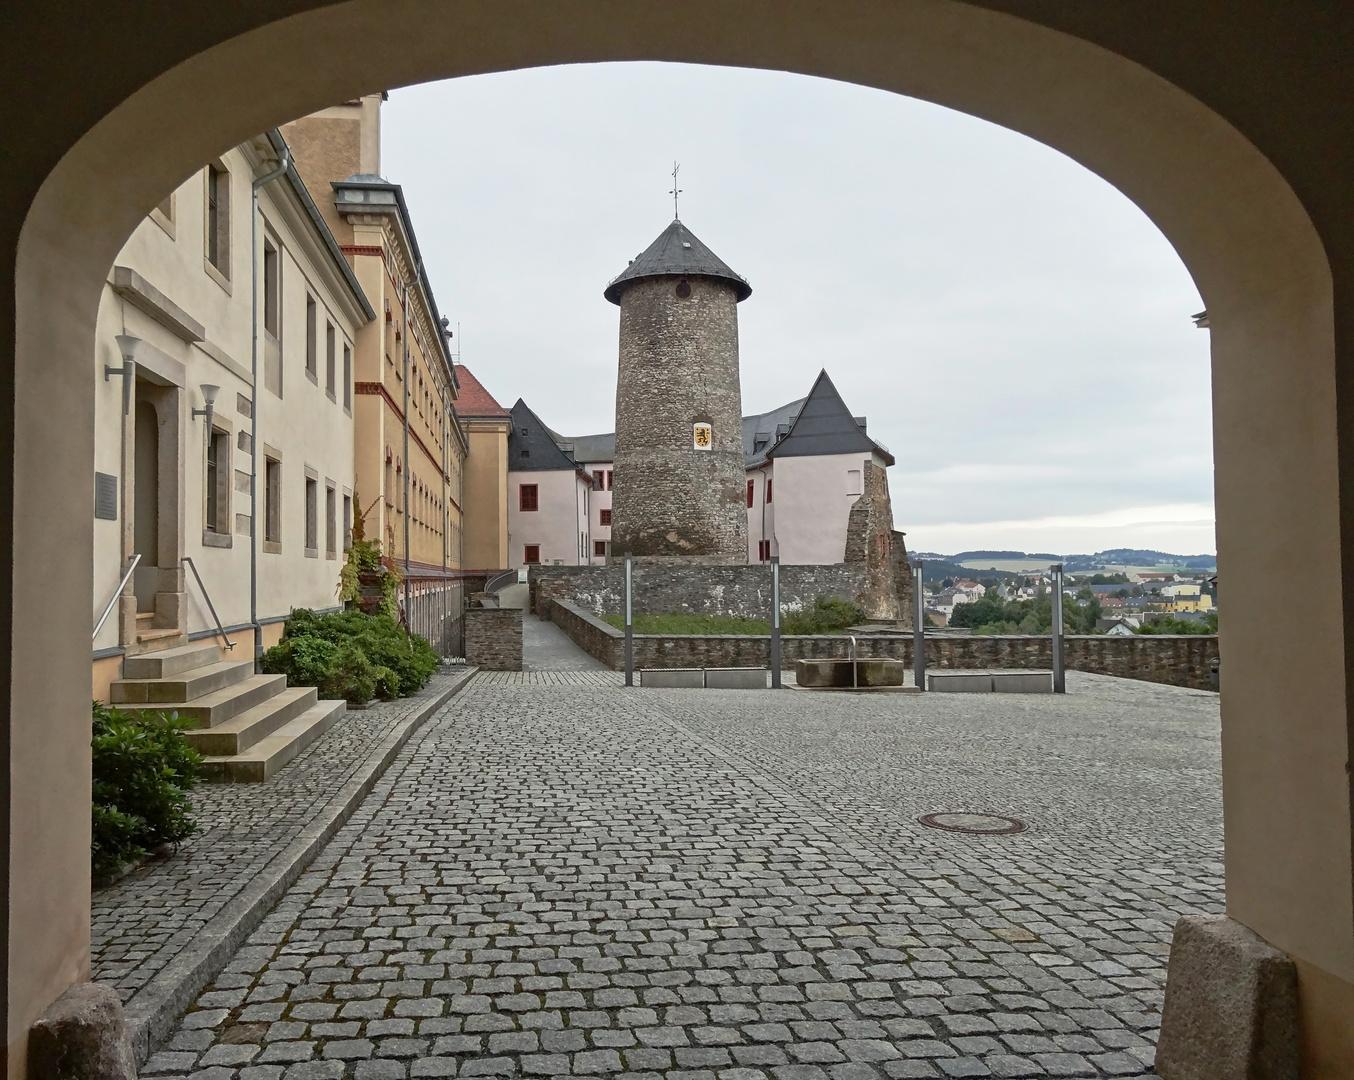 Schloss Voigtsberg (Oelsnitz)